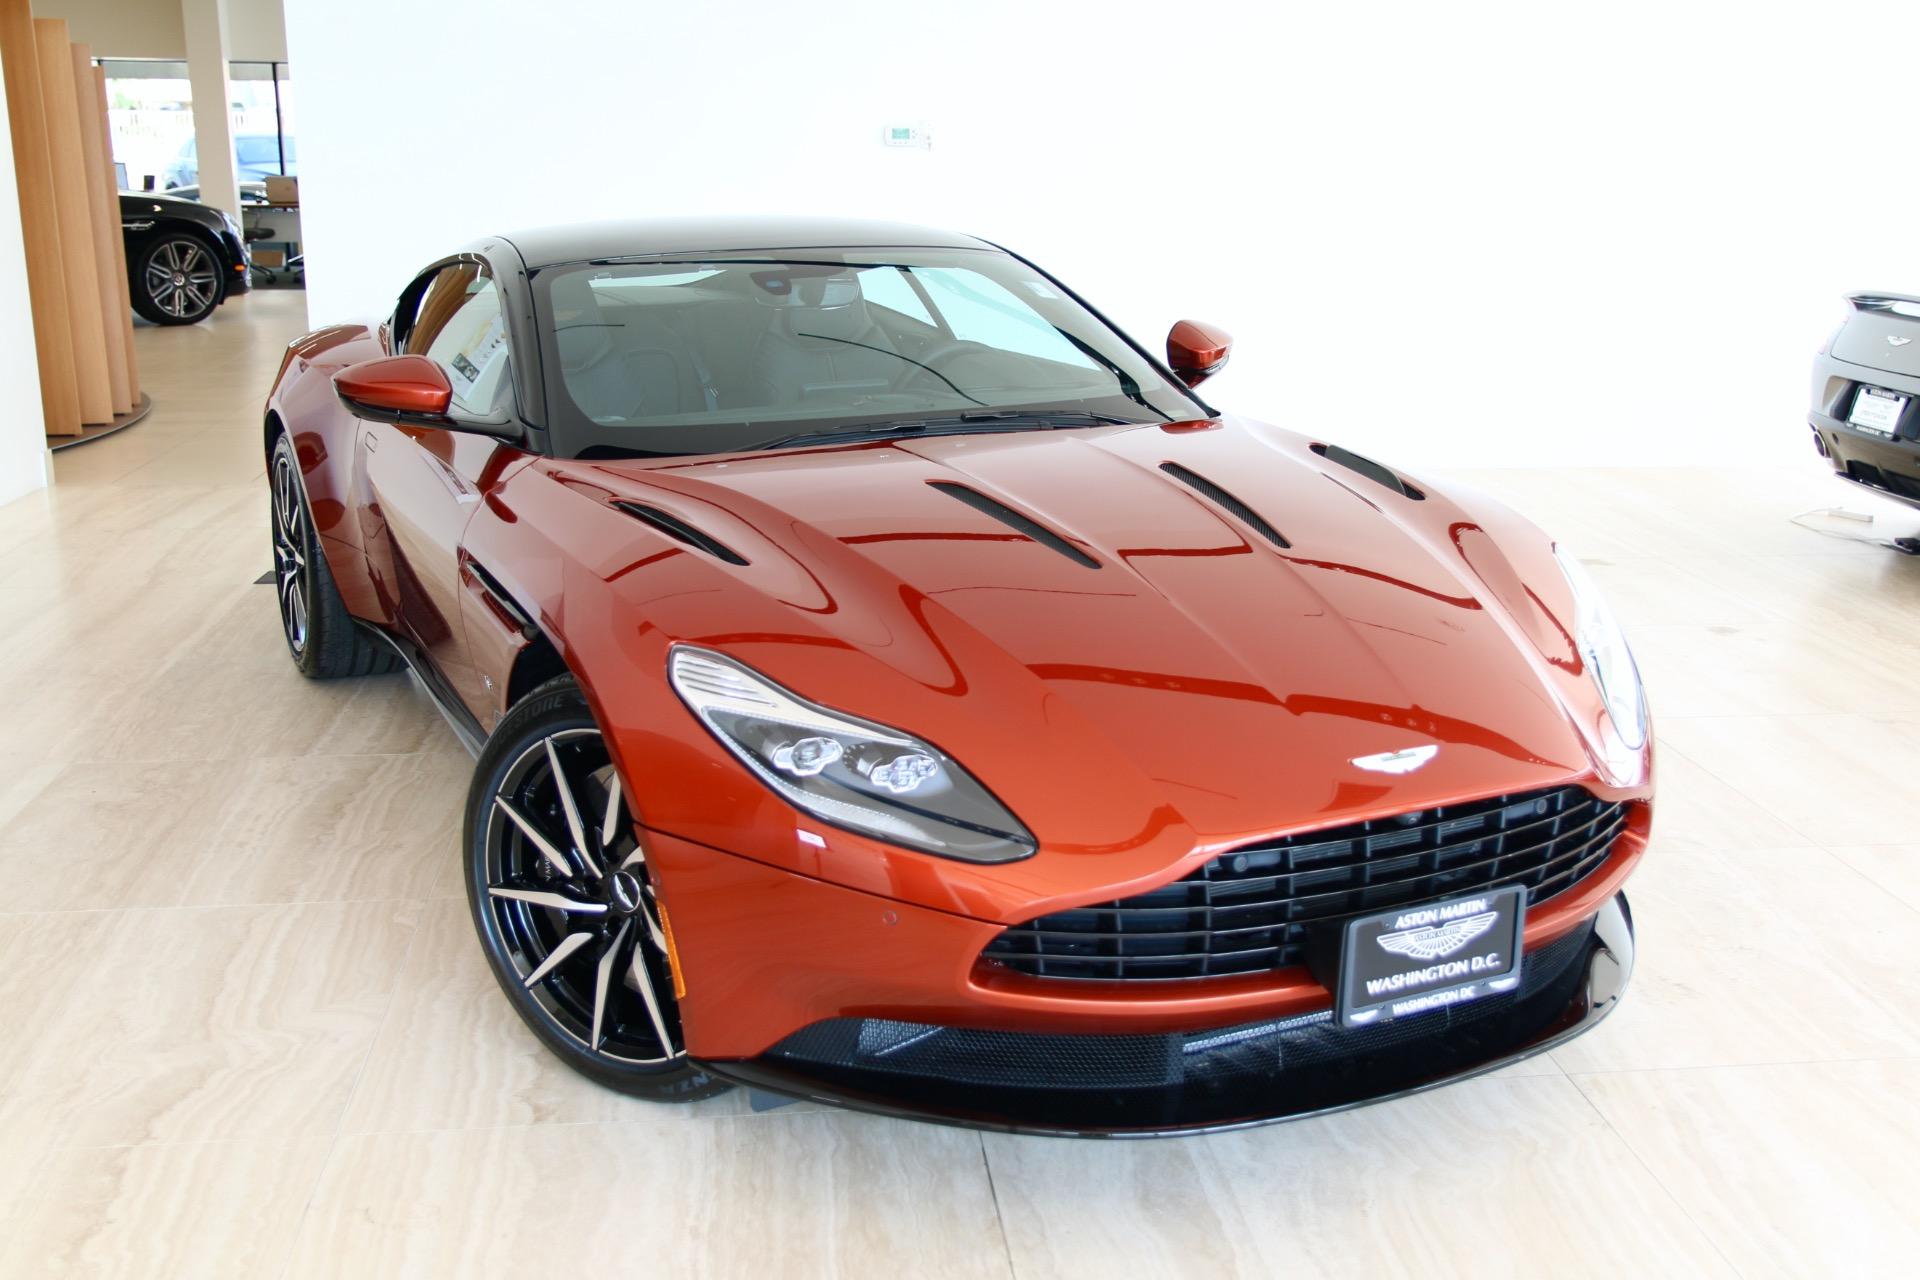 2017 Aston Martin Db11 Stock 7nl02494 For Sale Near Vienna Va